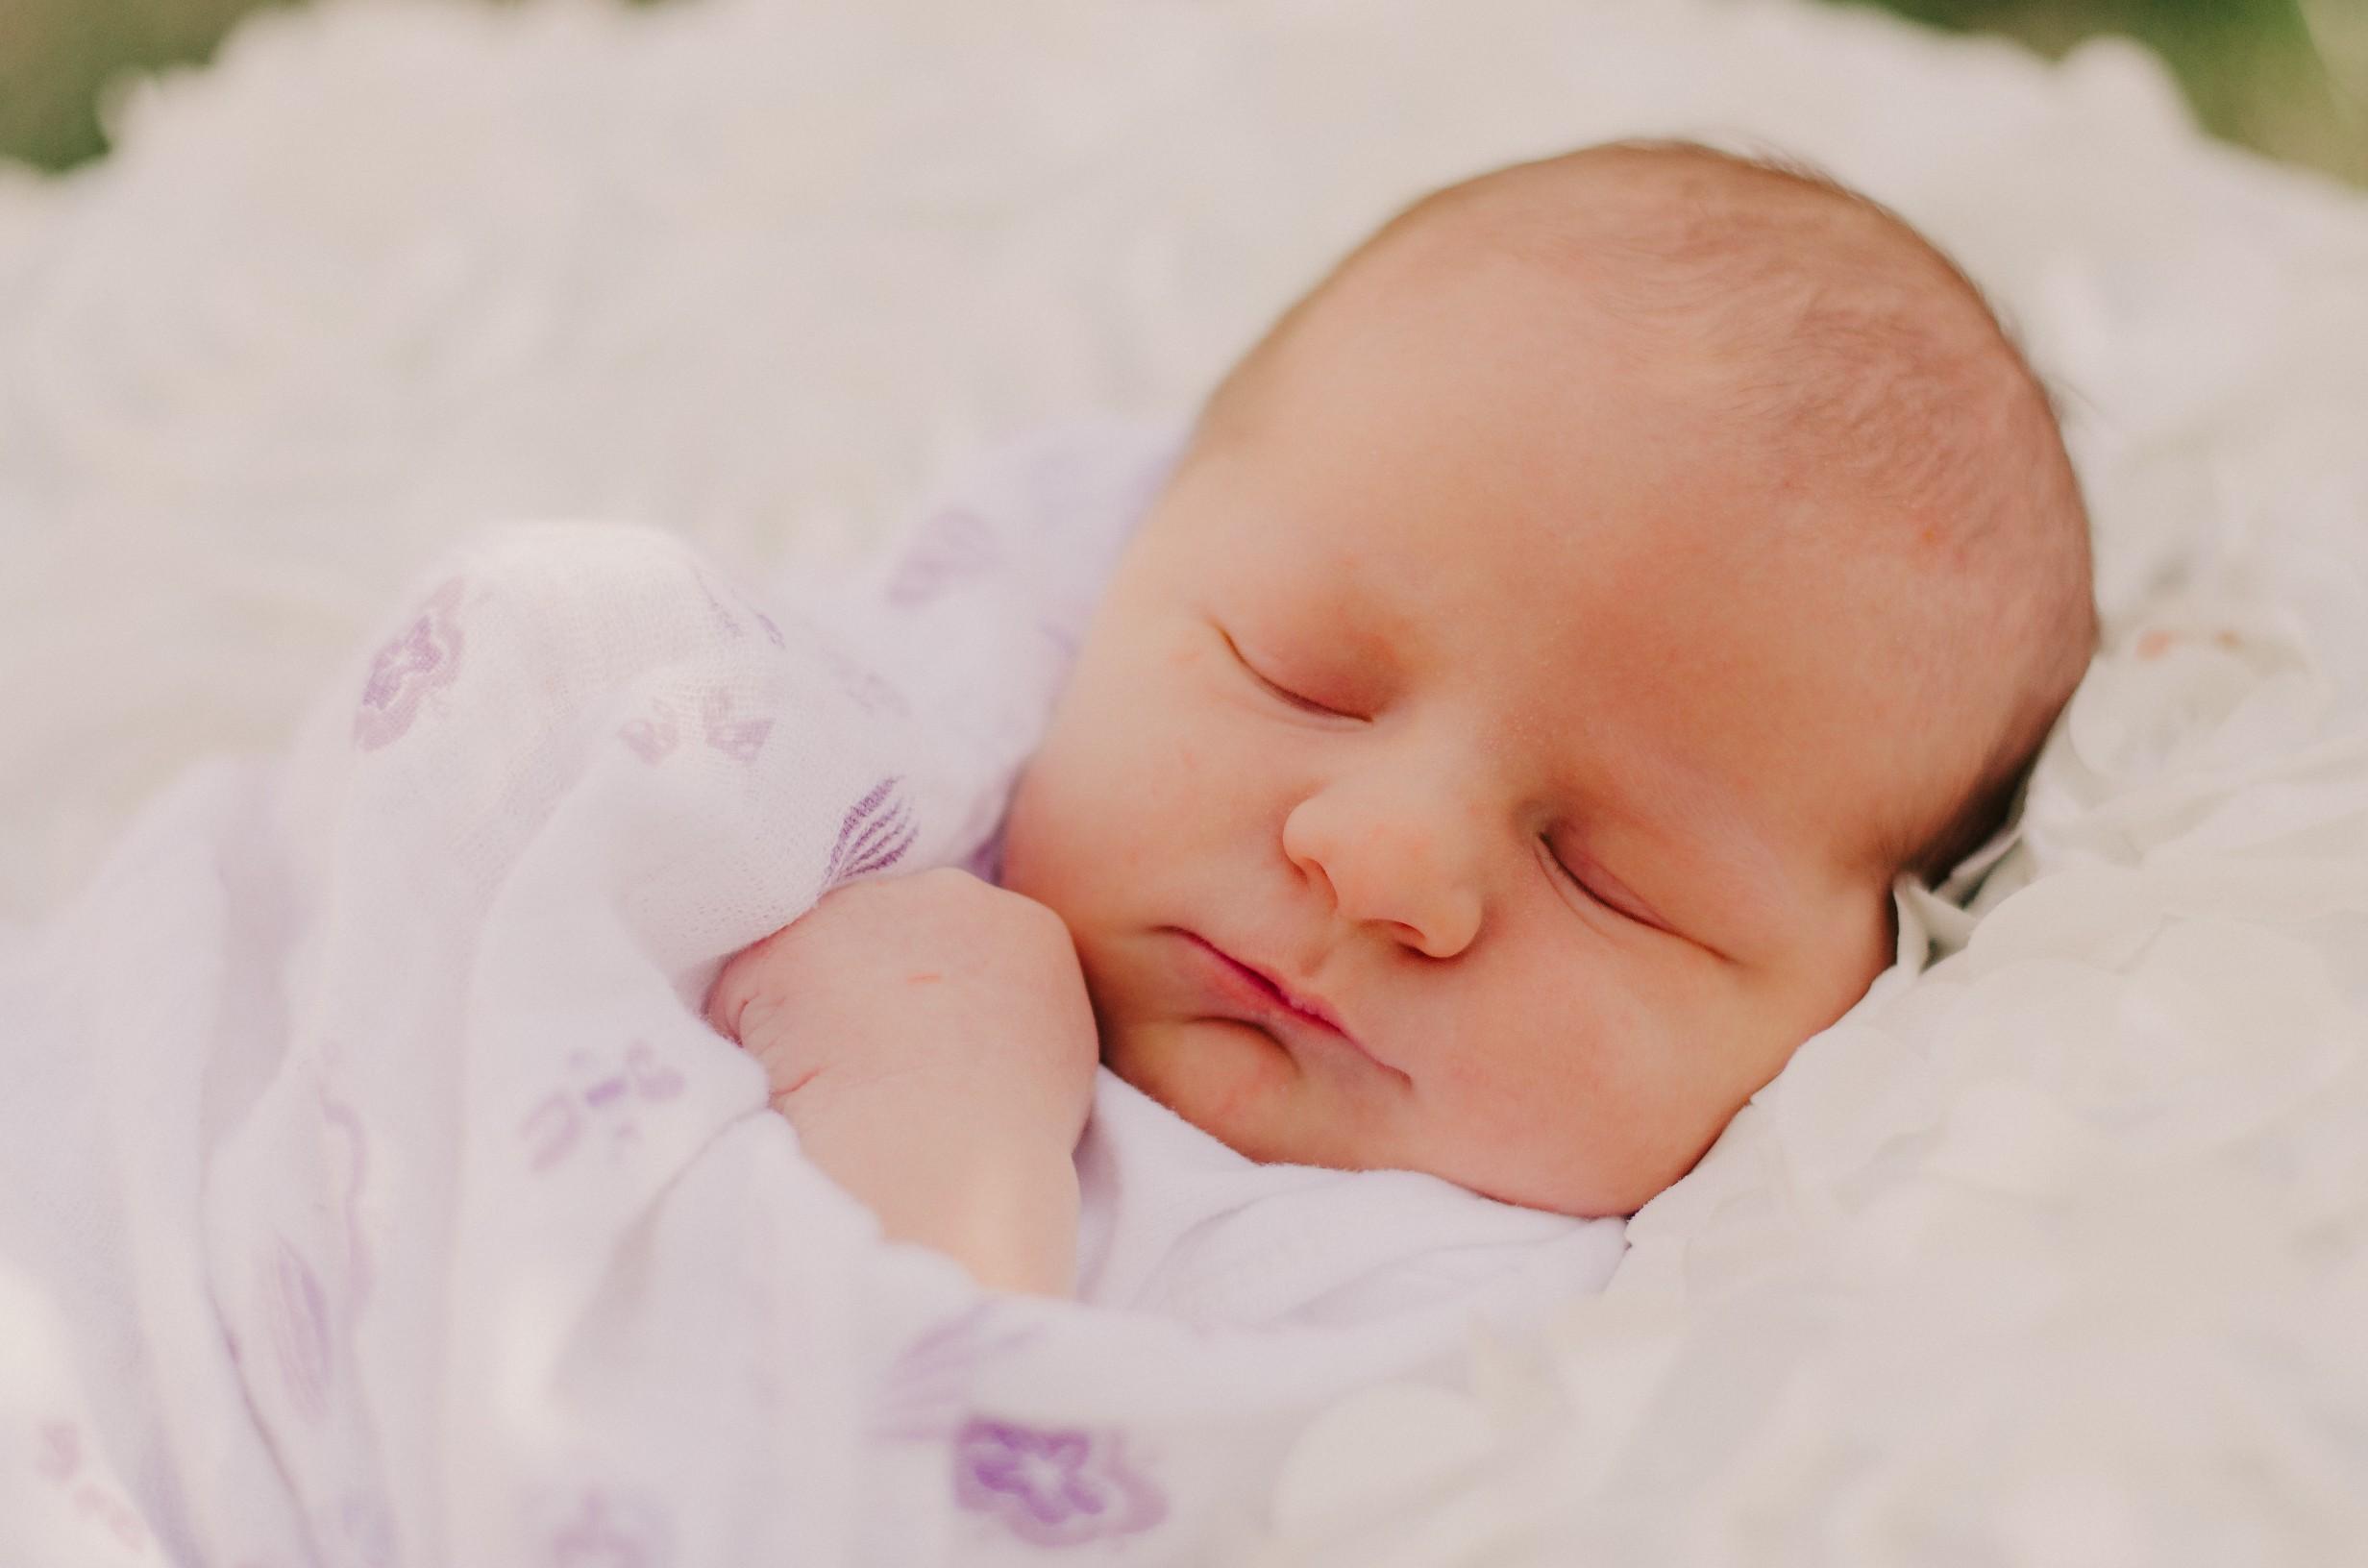 newborn-photography-session-hord-family.jpg.